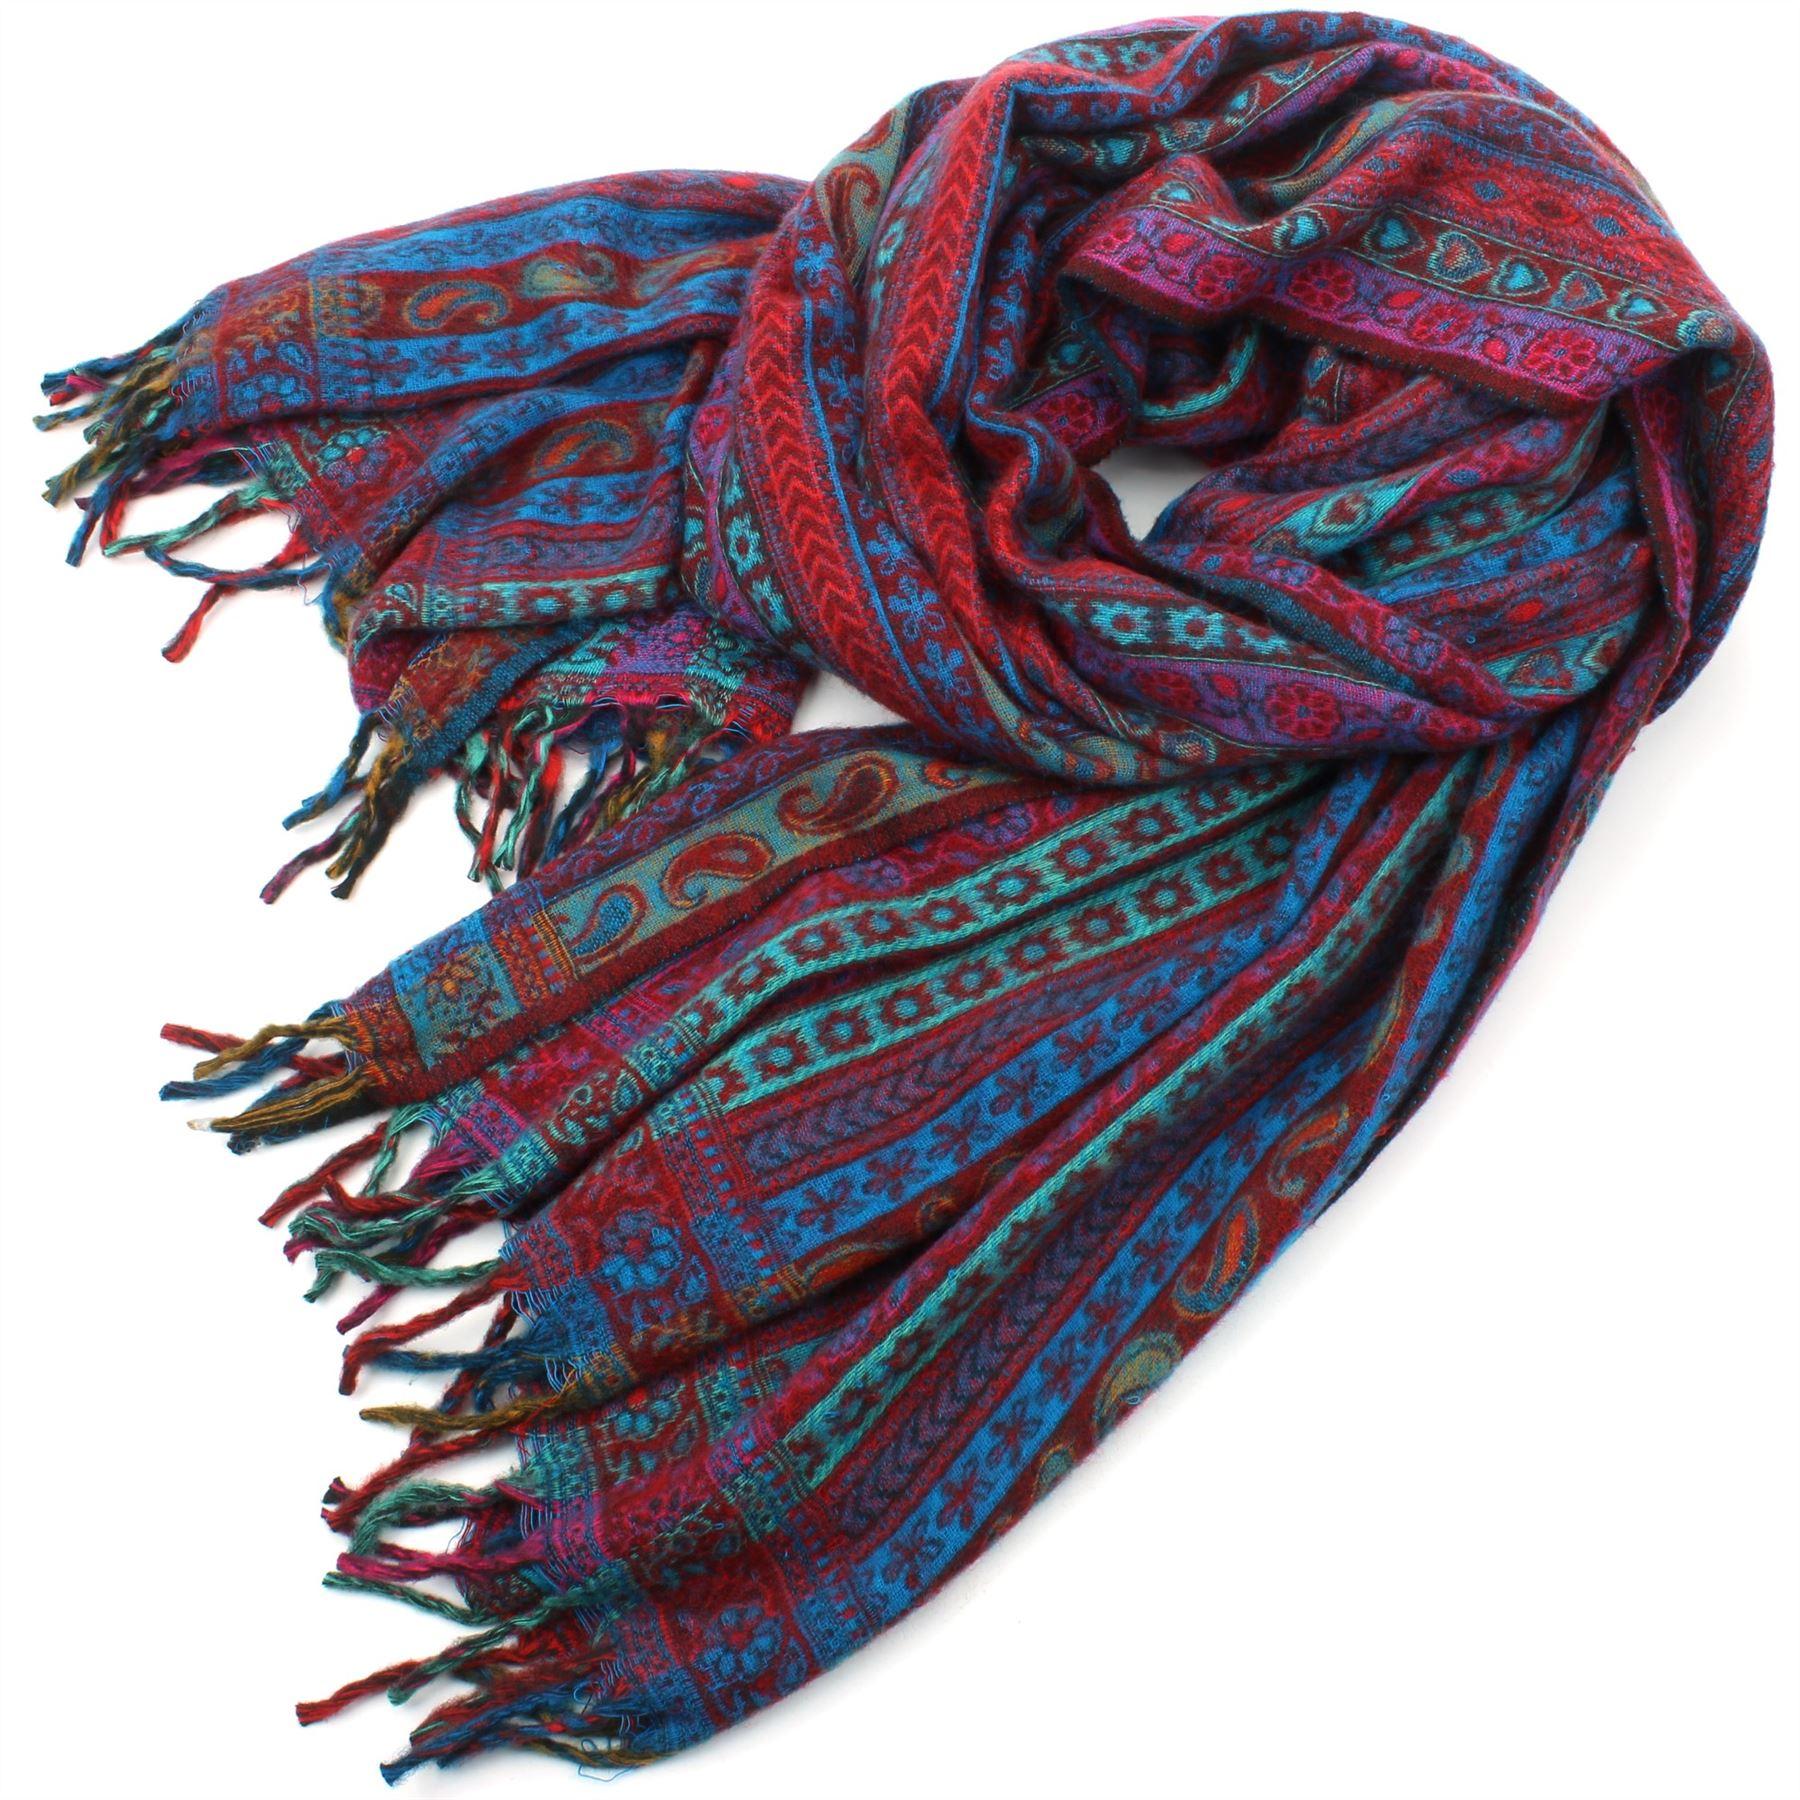 Acrylic-Wool-Blanket-Shawl-Wrap-Throw-Finest-Softest-India-Stripe-Paisley-Travel thumbnail 45